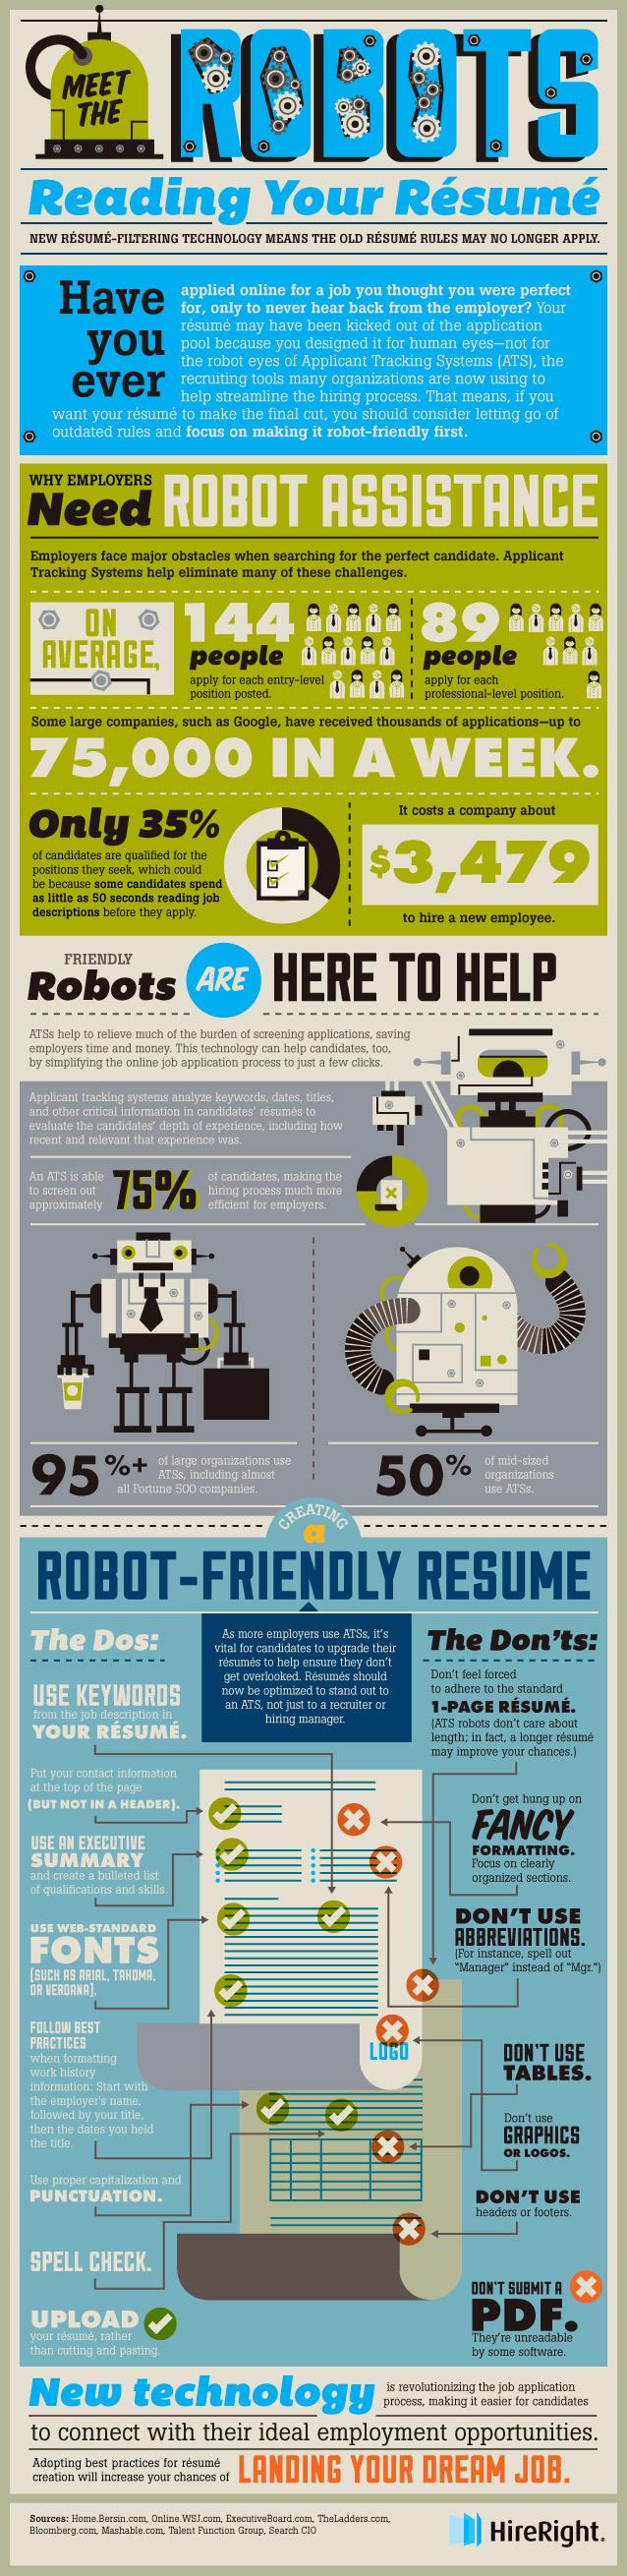 how-impress-robots-reading-resume-infographic